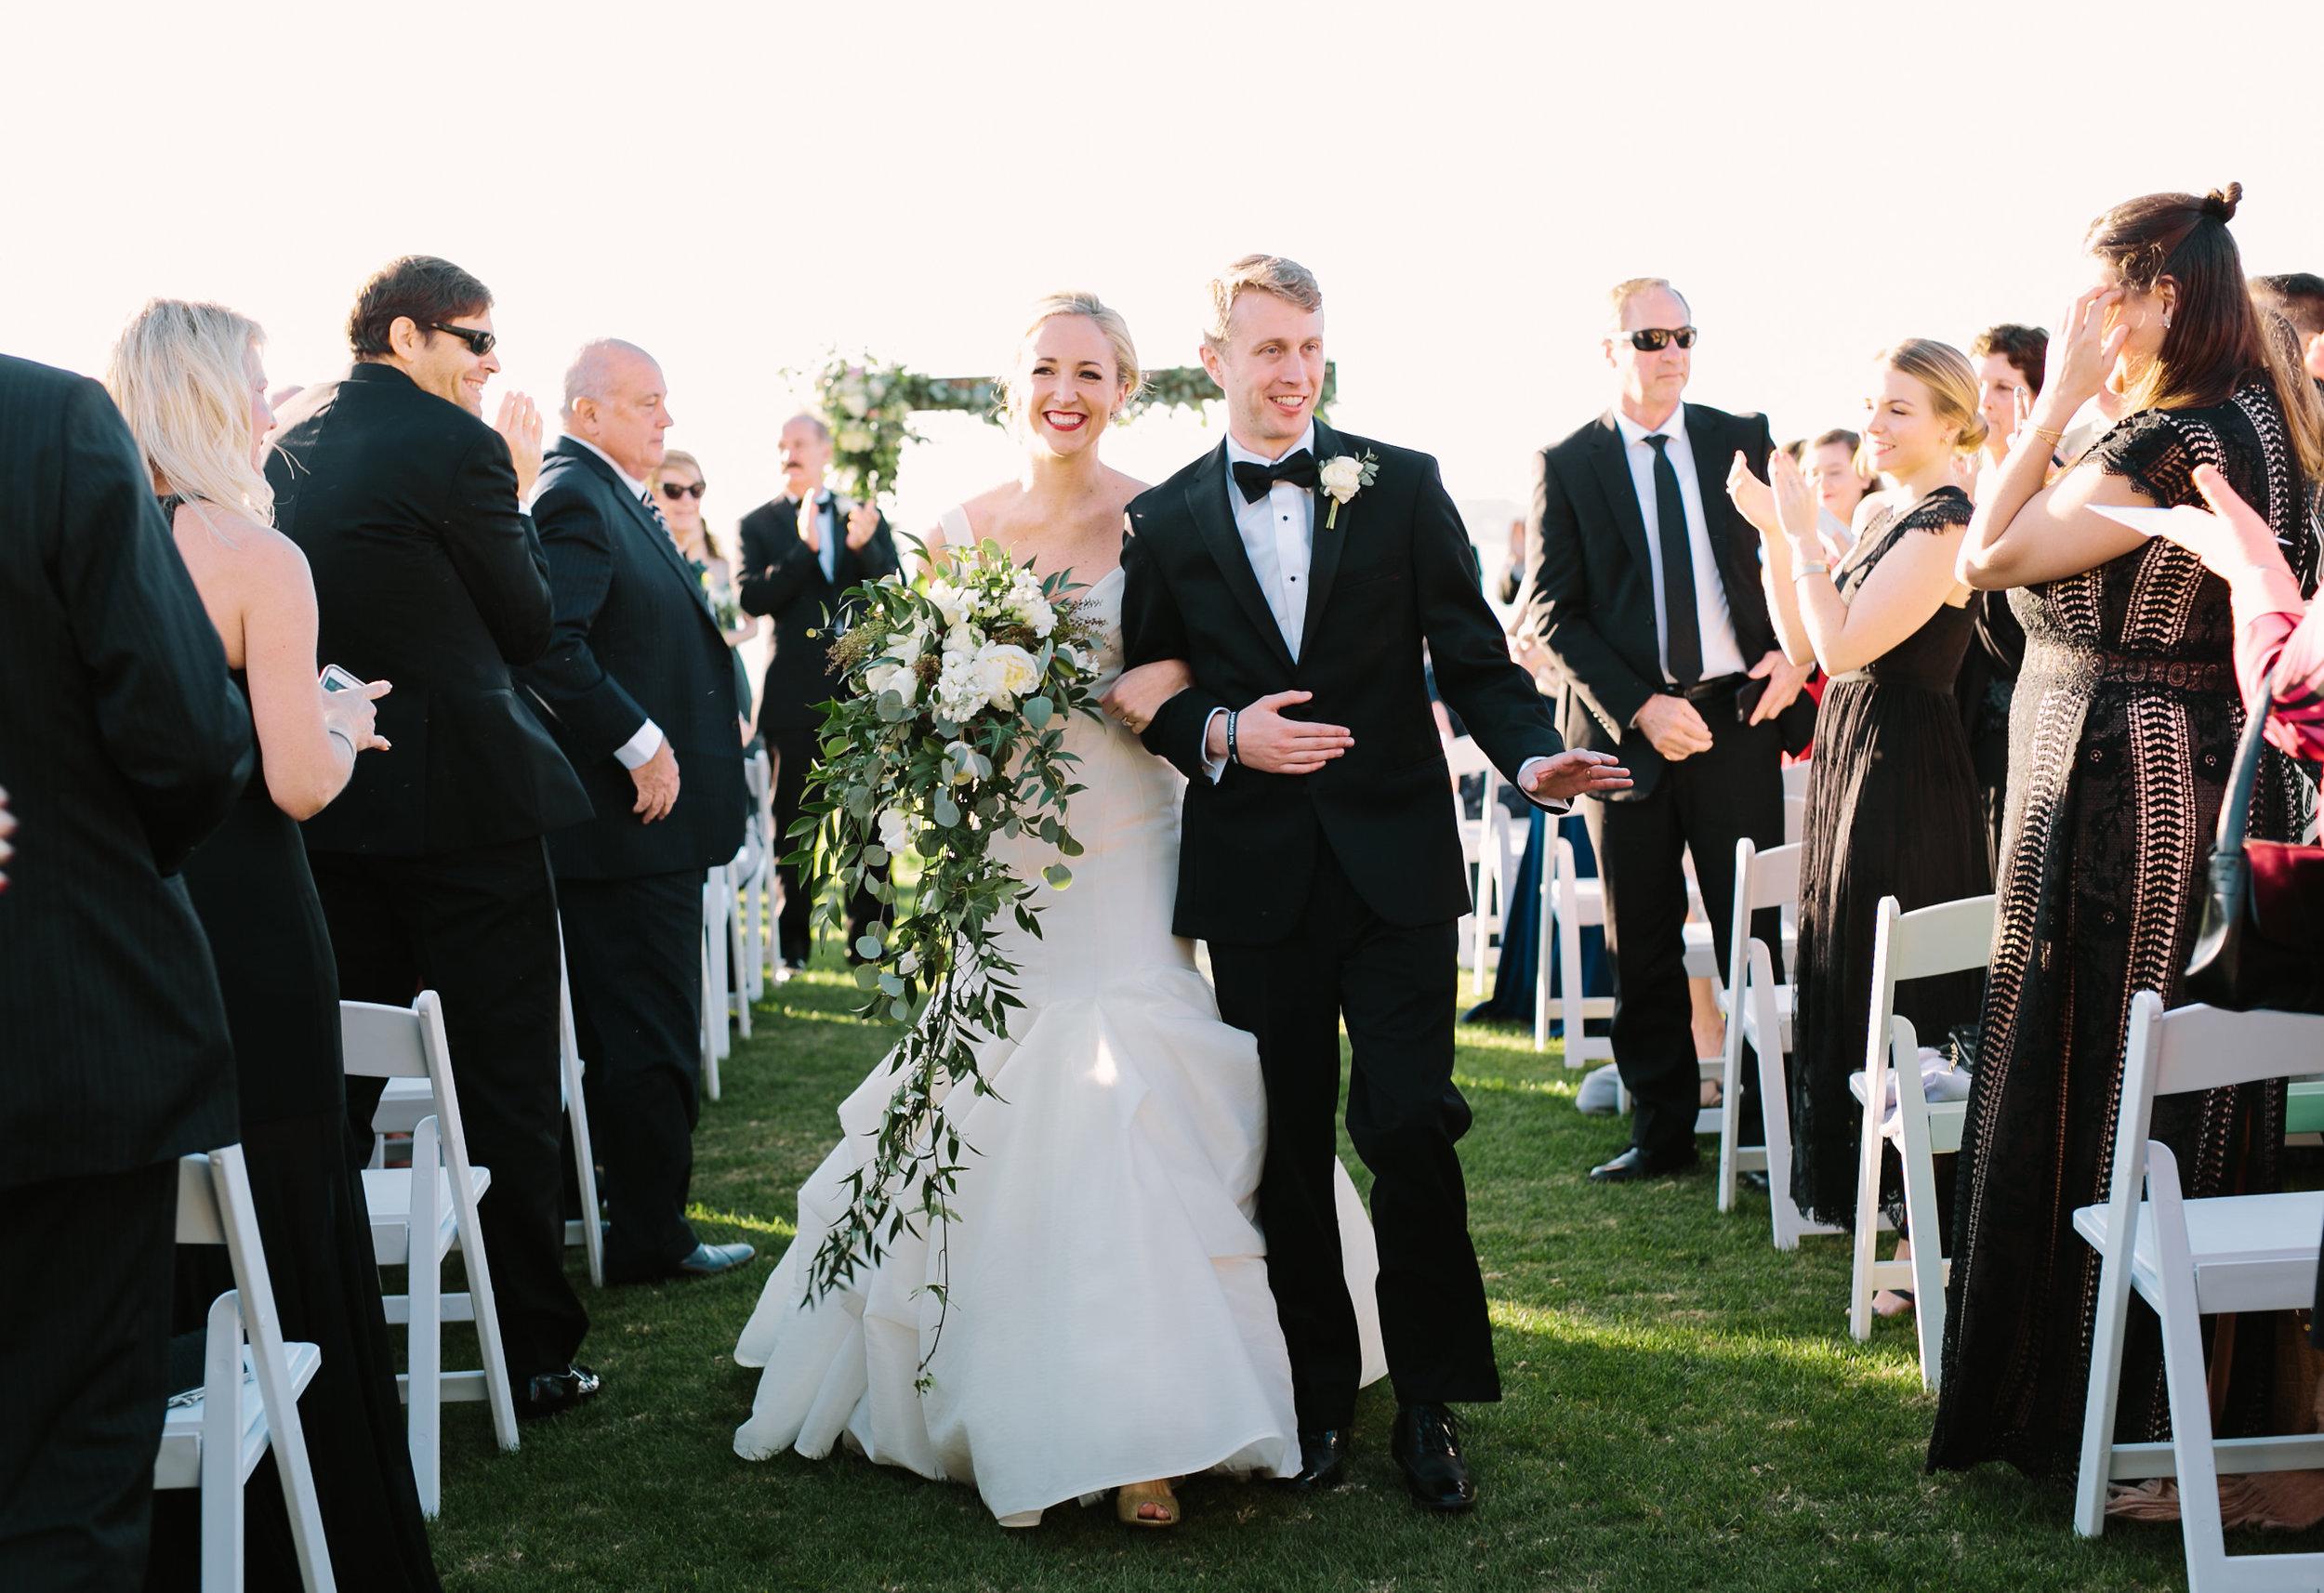 katie & jackson - Sea Pines Resort wedding